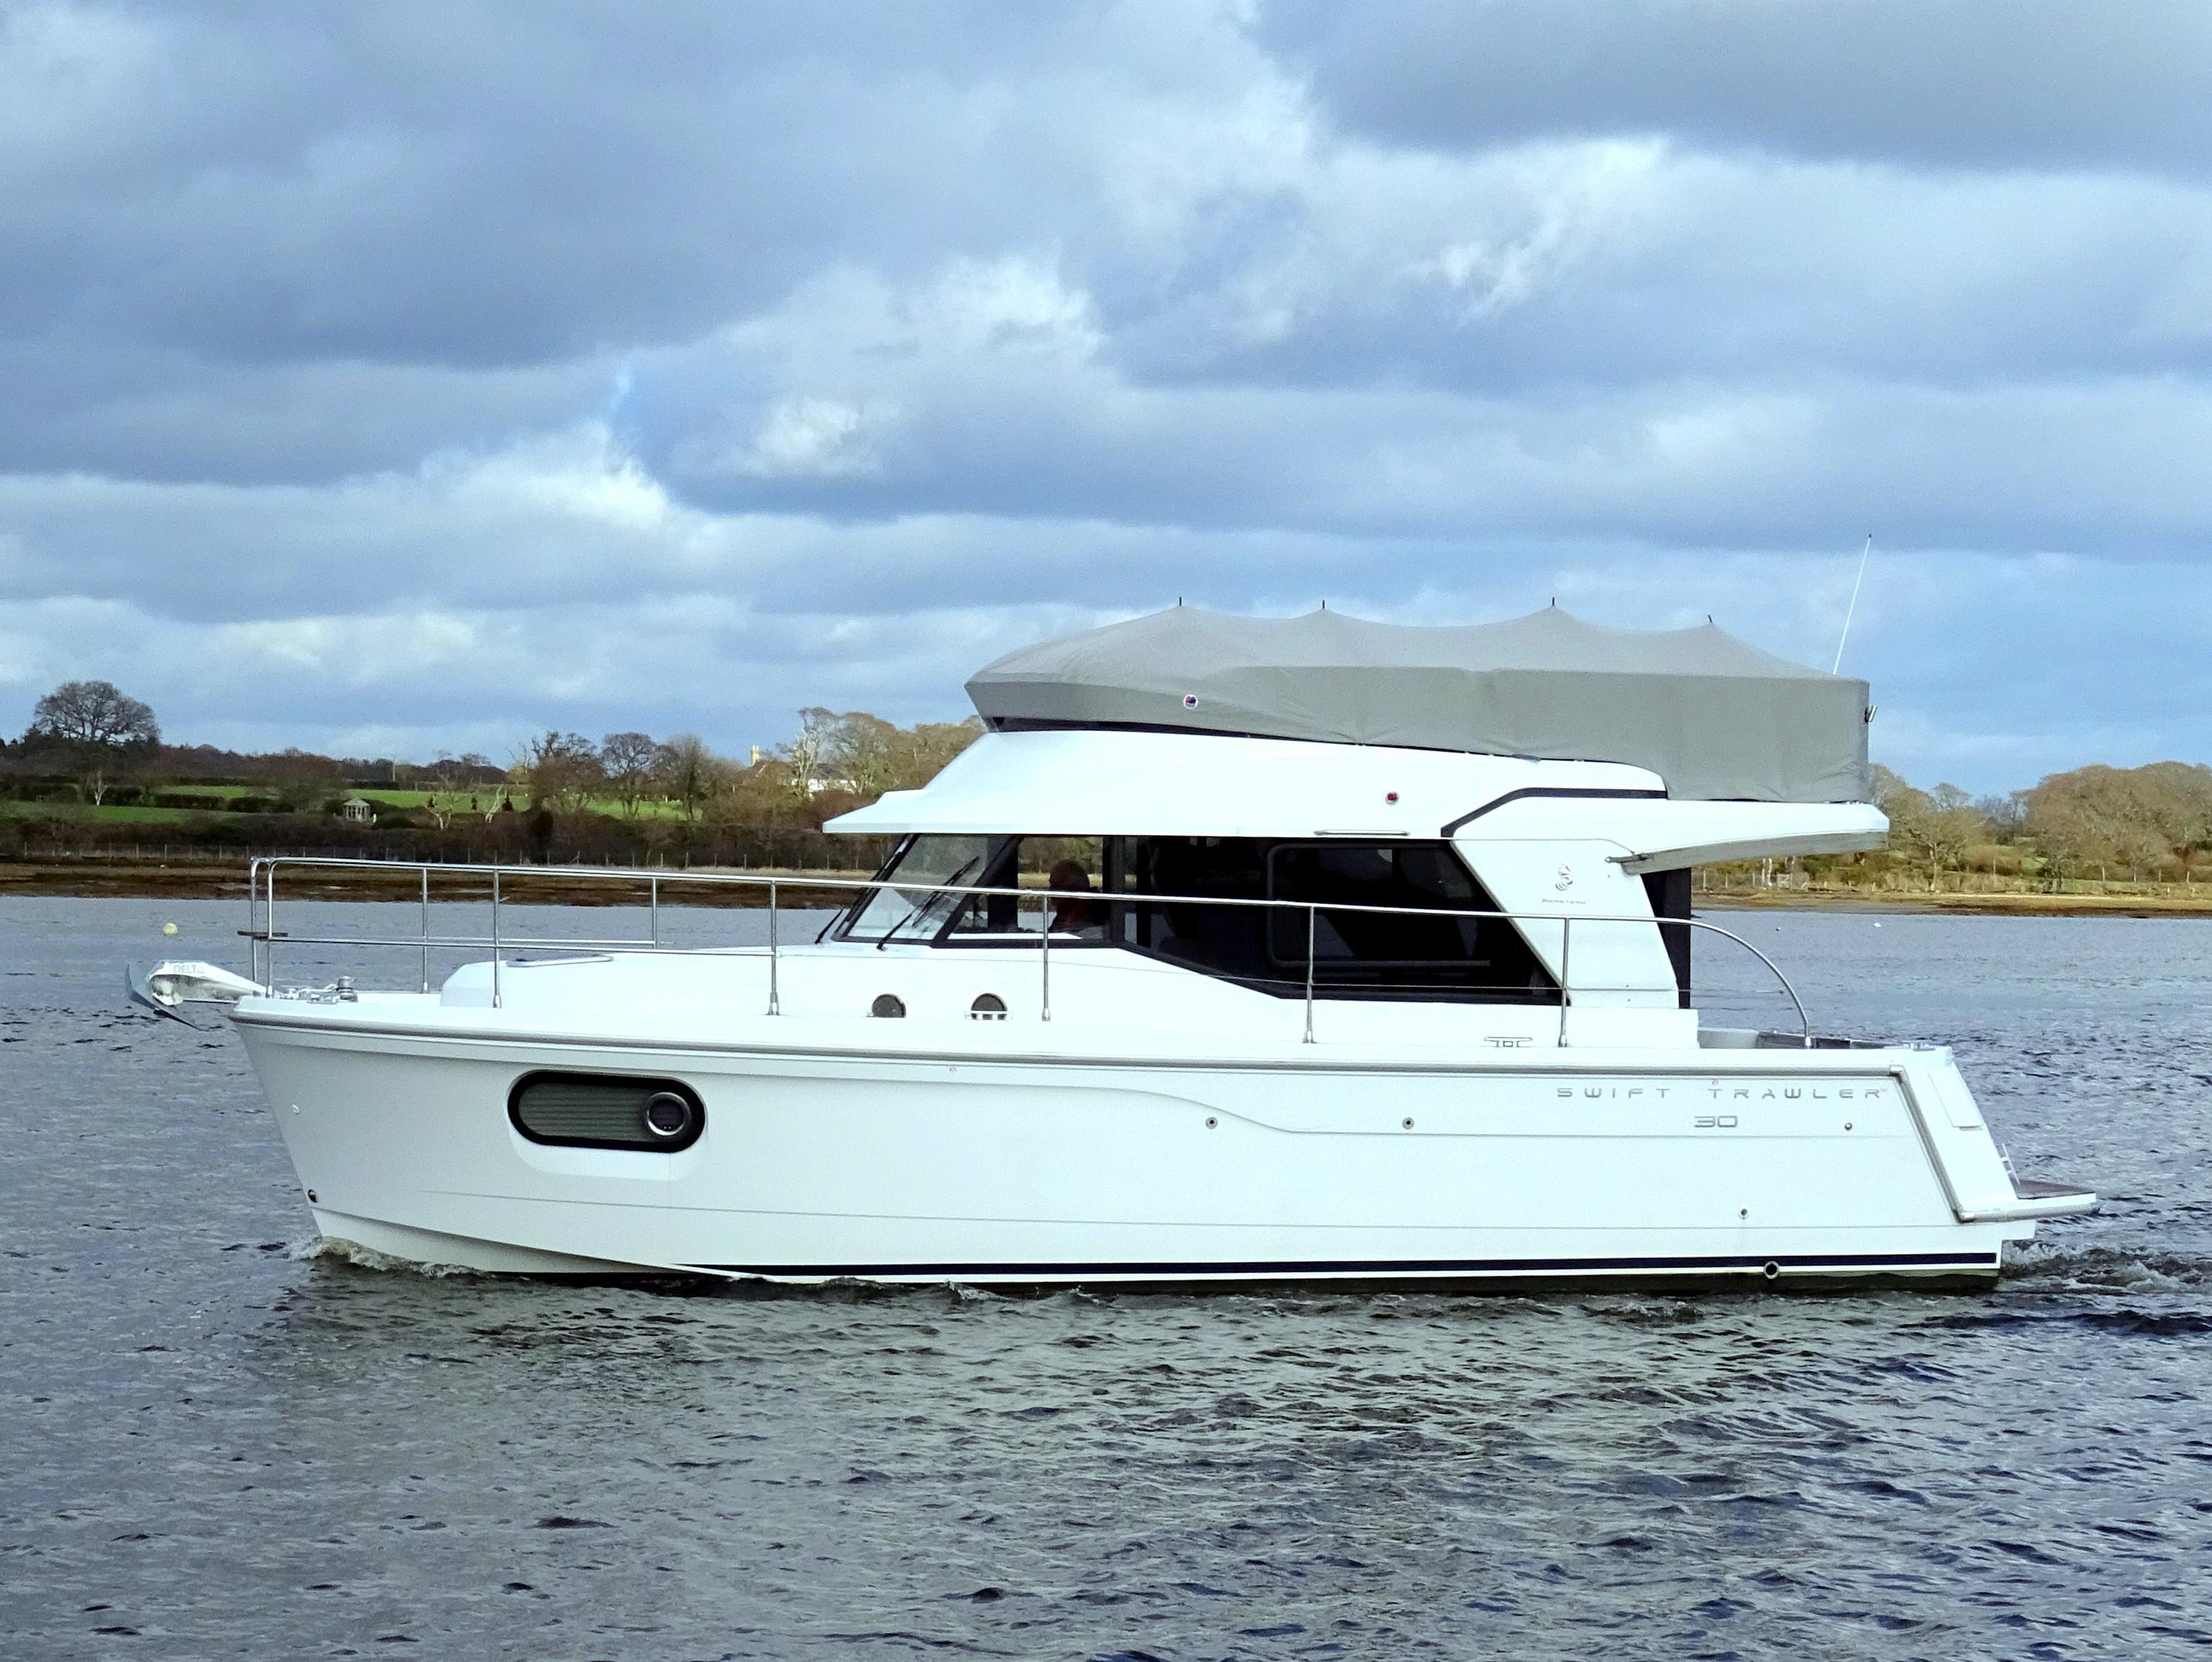 Beneteau Swift Trawler 30 Beneteau Swift Trawler 30